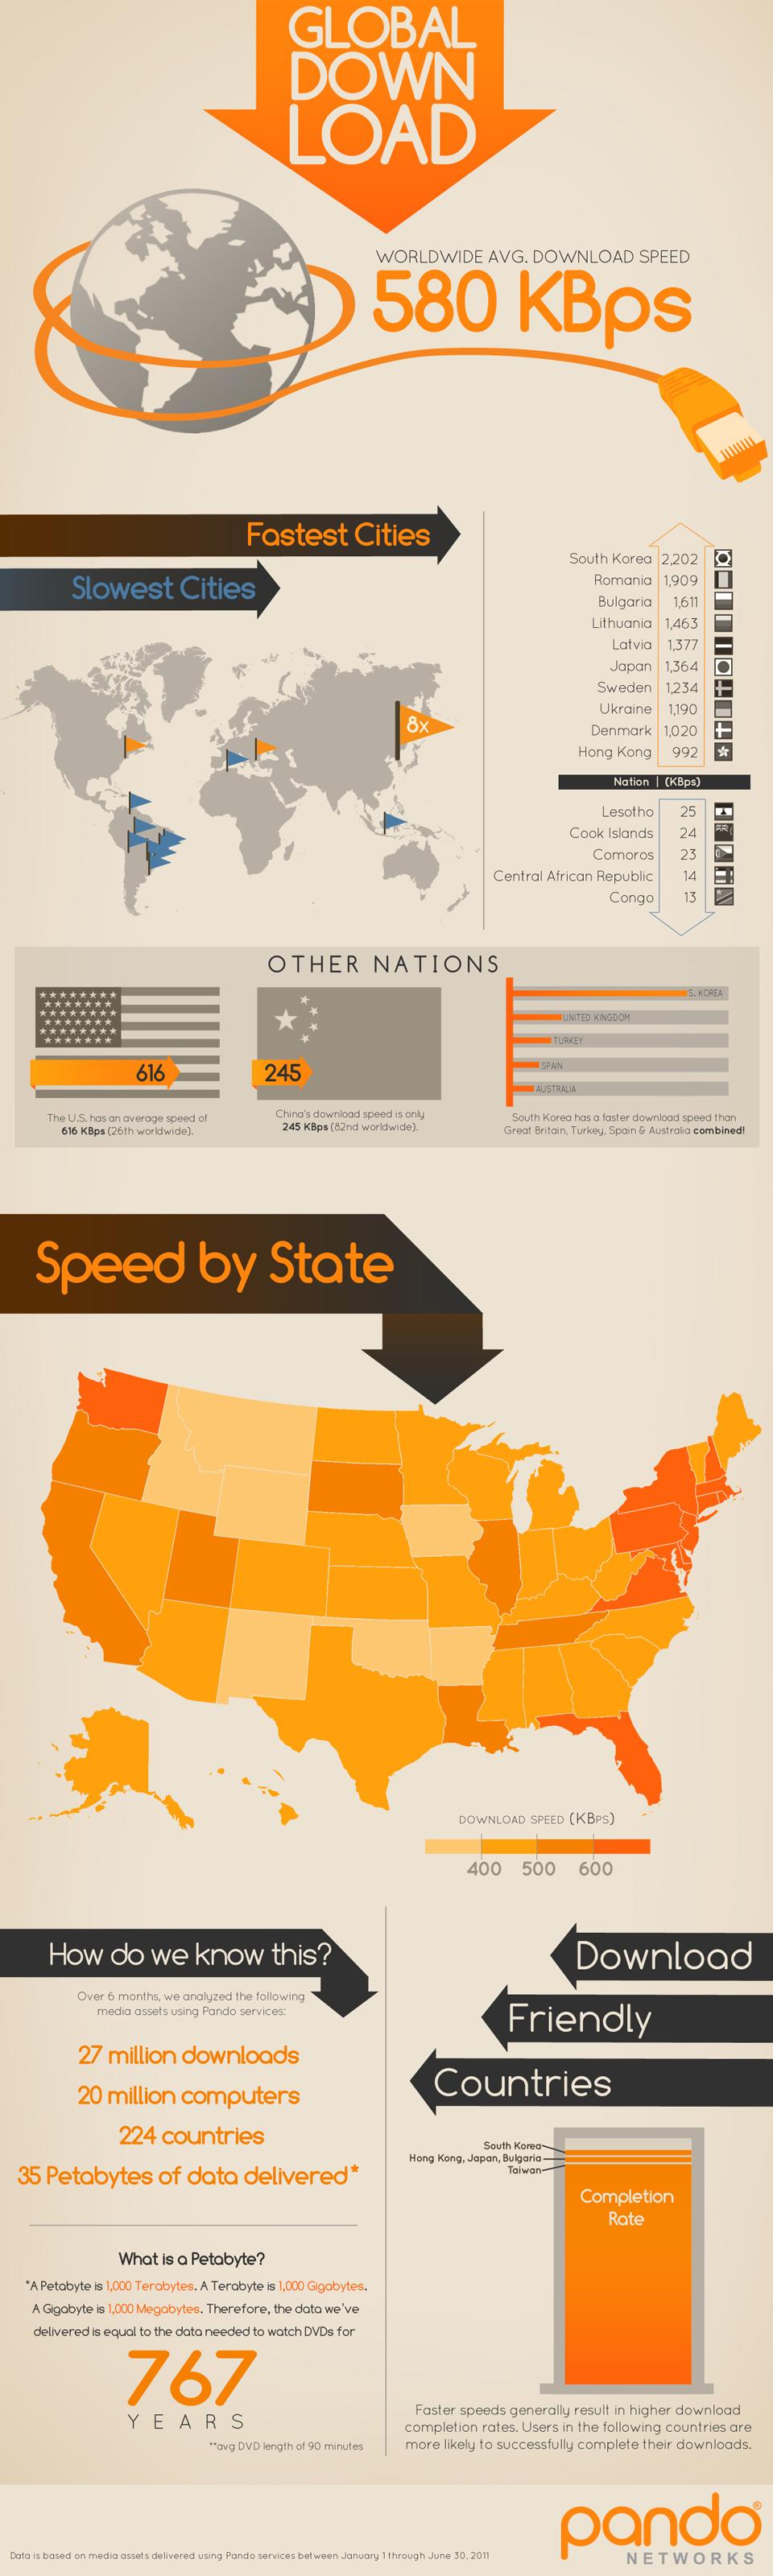 http://4.mshcdn.com/wp-content/uploads/2011/09/world-internet-speeds-pando.jpg